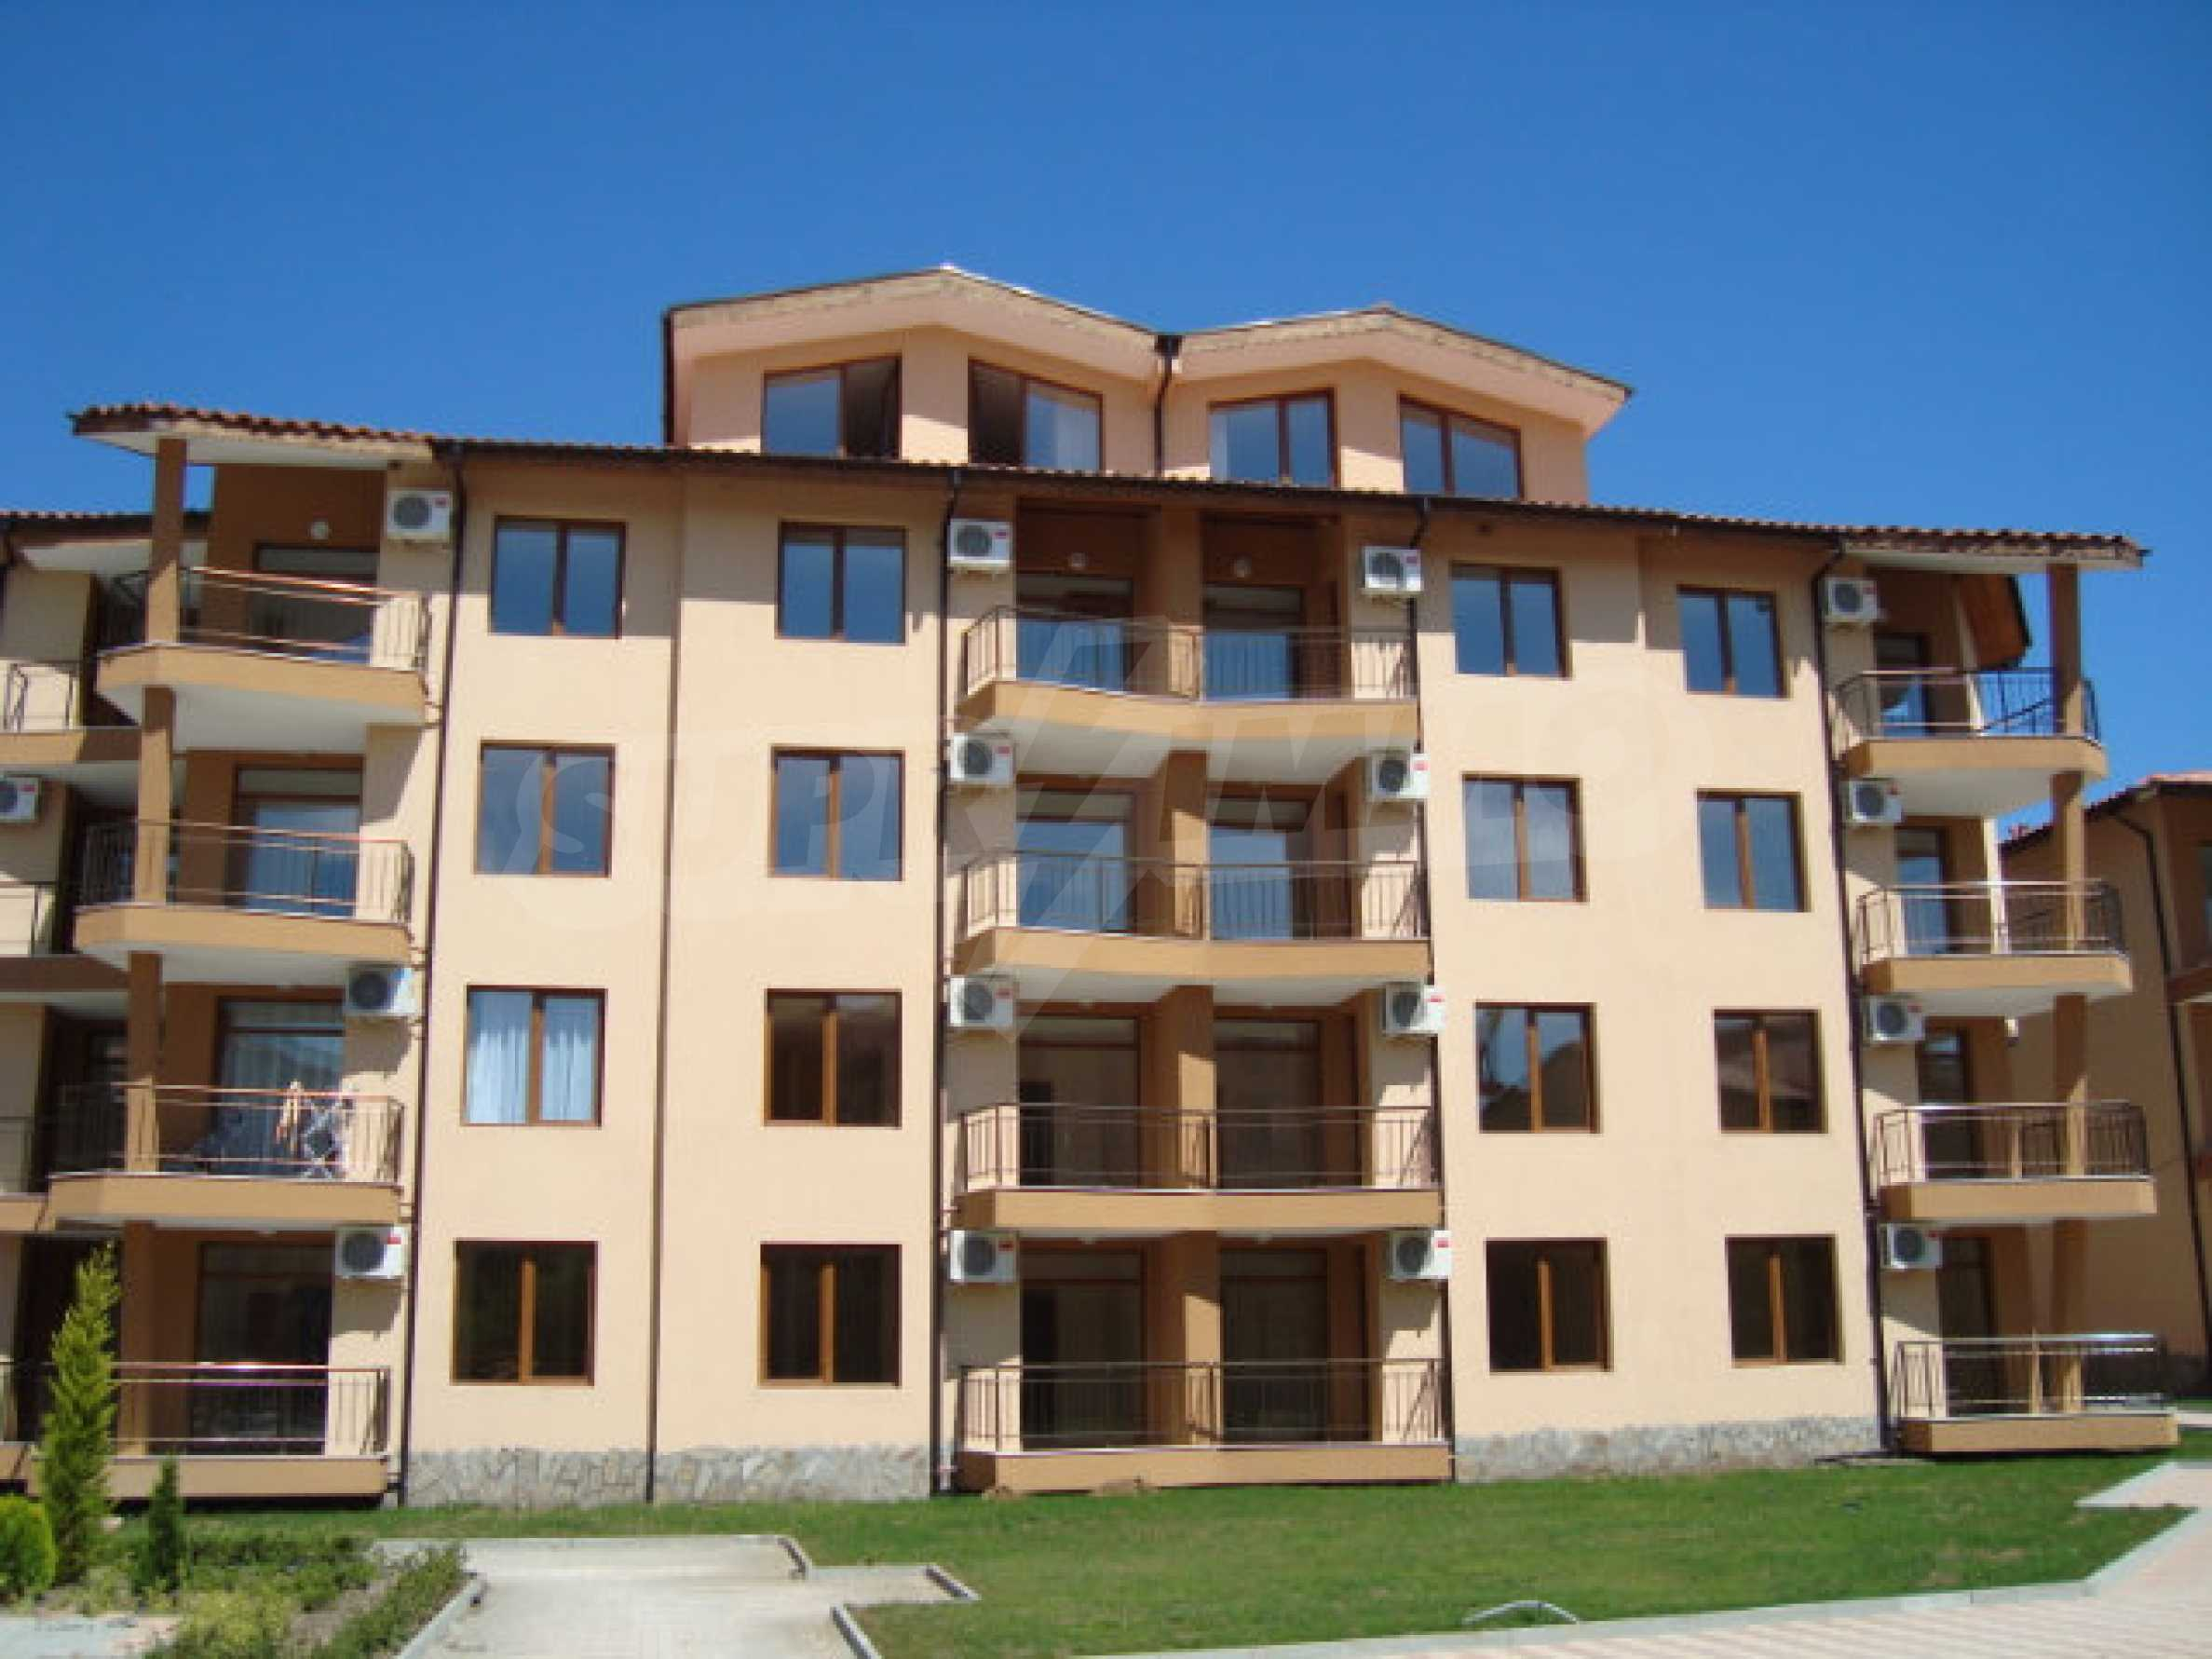 Studios und Apartments im Nestinarka-Komplex in Tsarevo 16